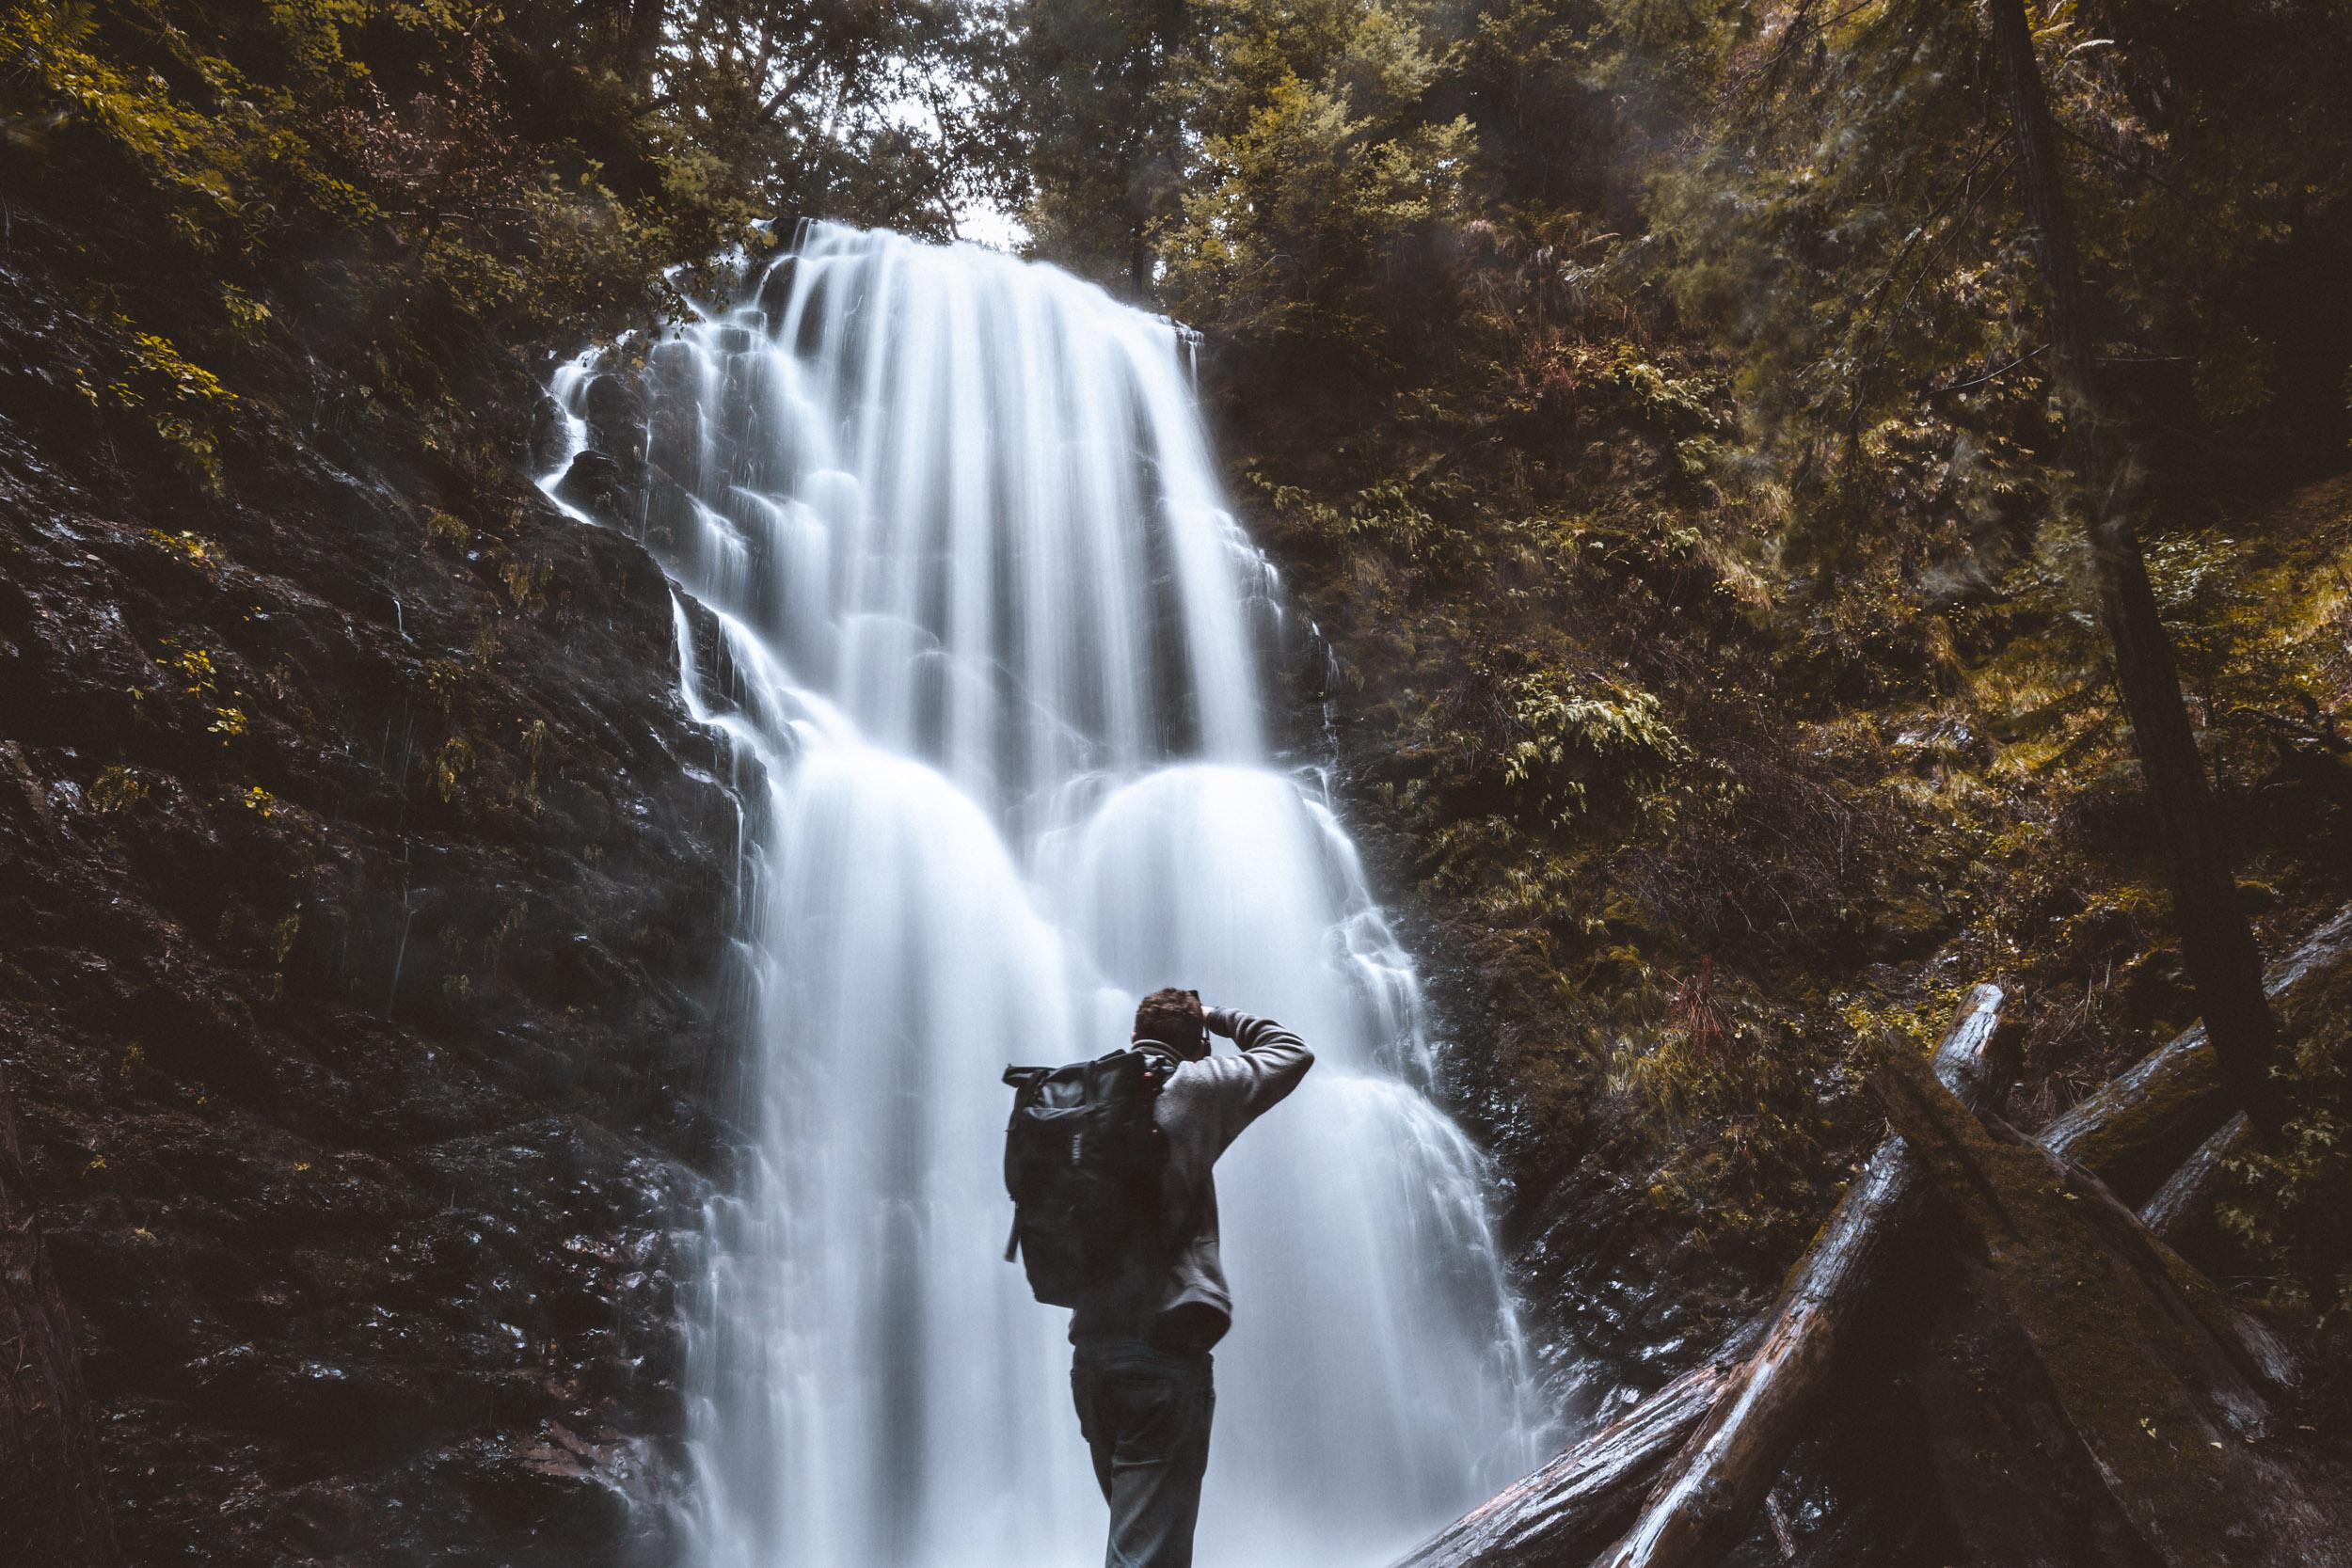 berry-creek-falls-hike-and-shoot-1.jpg